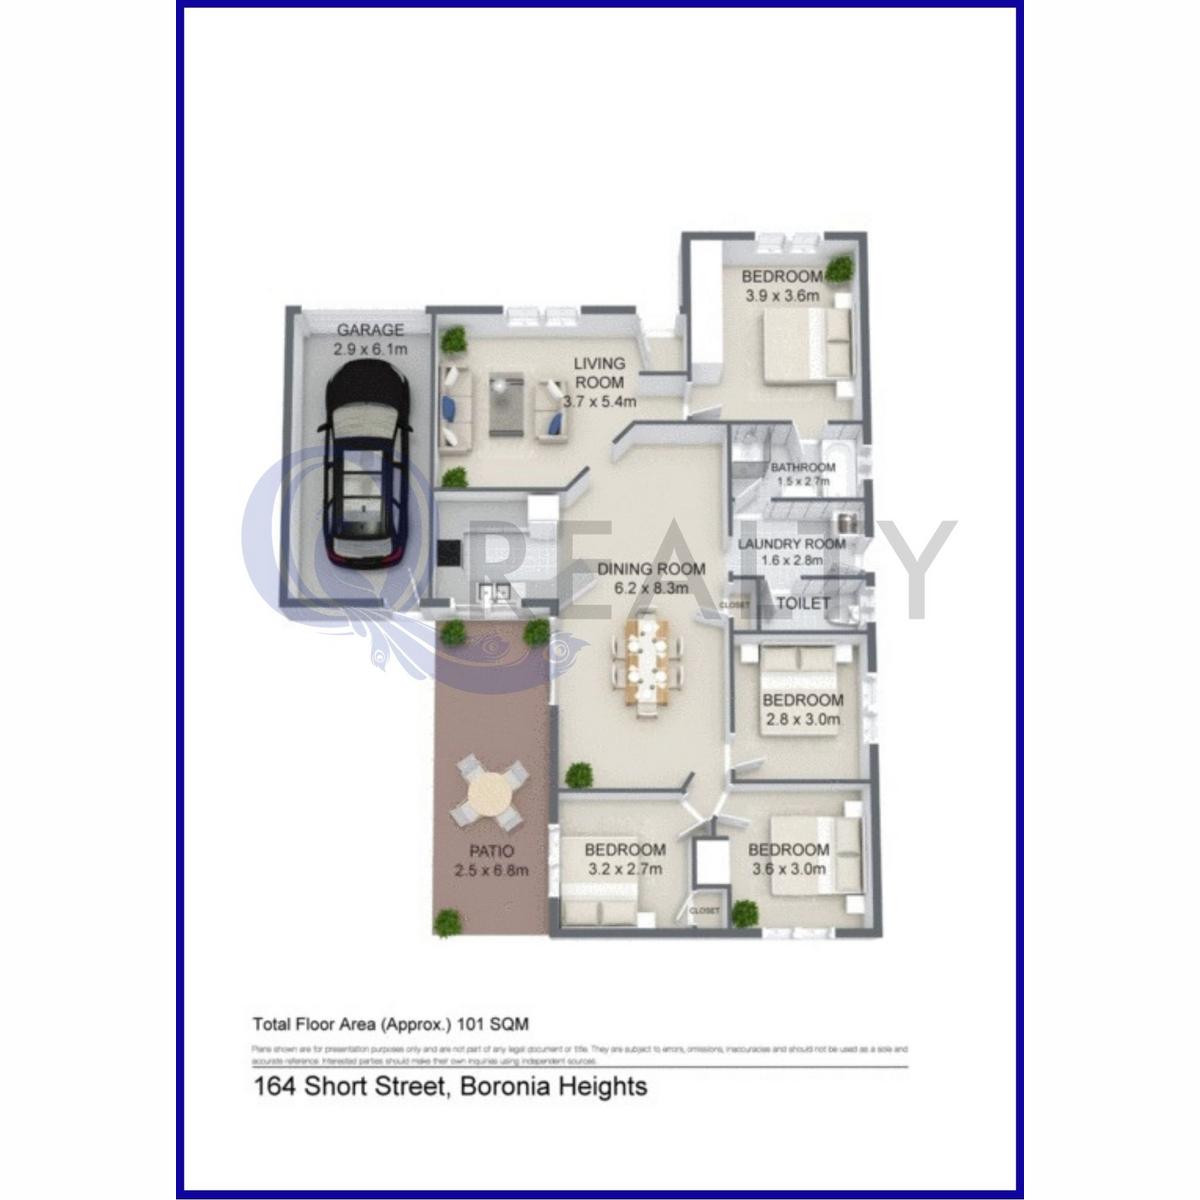 164 Short Street, Boronia Heights  QLD  4124